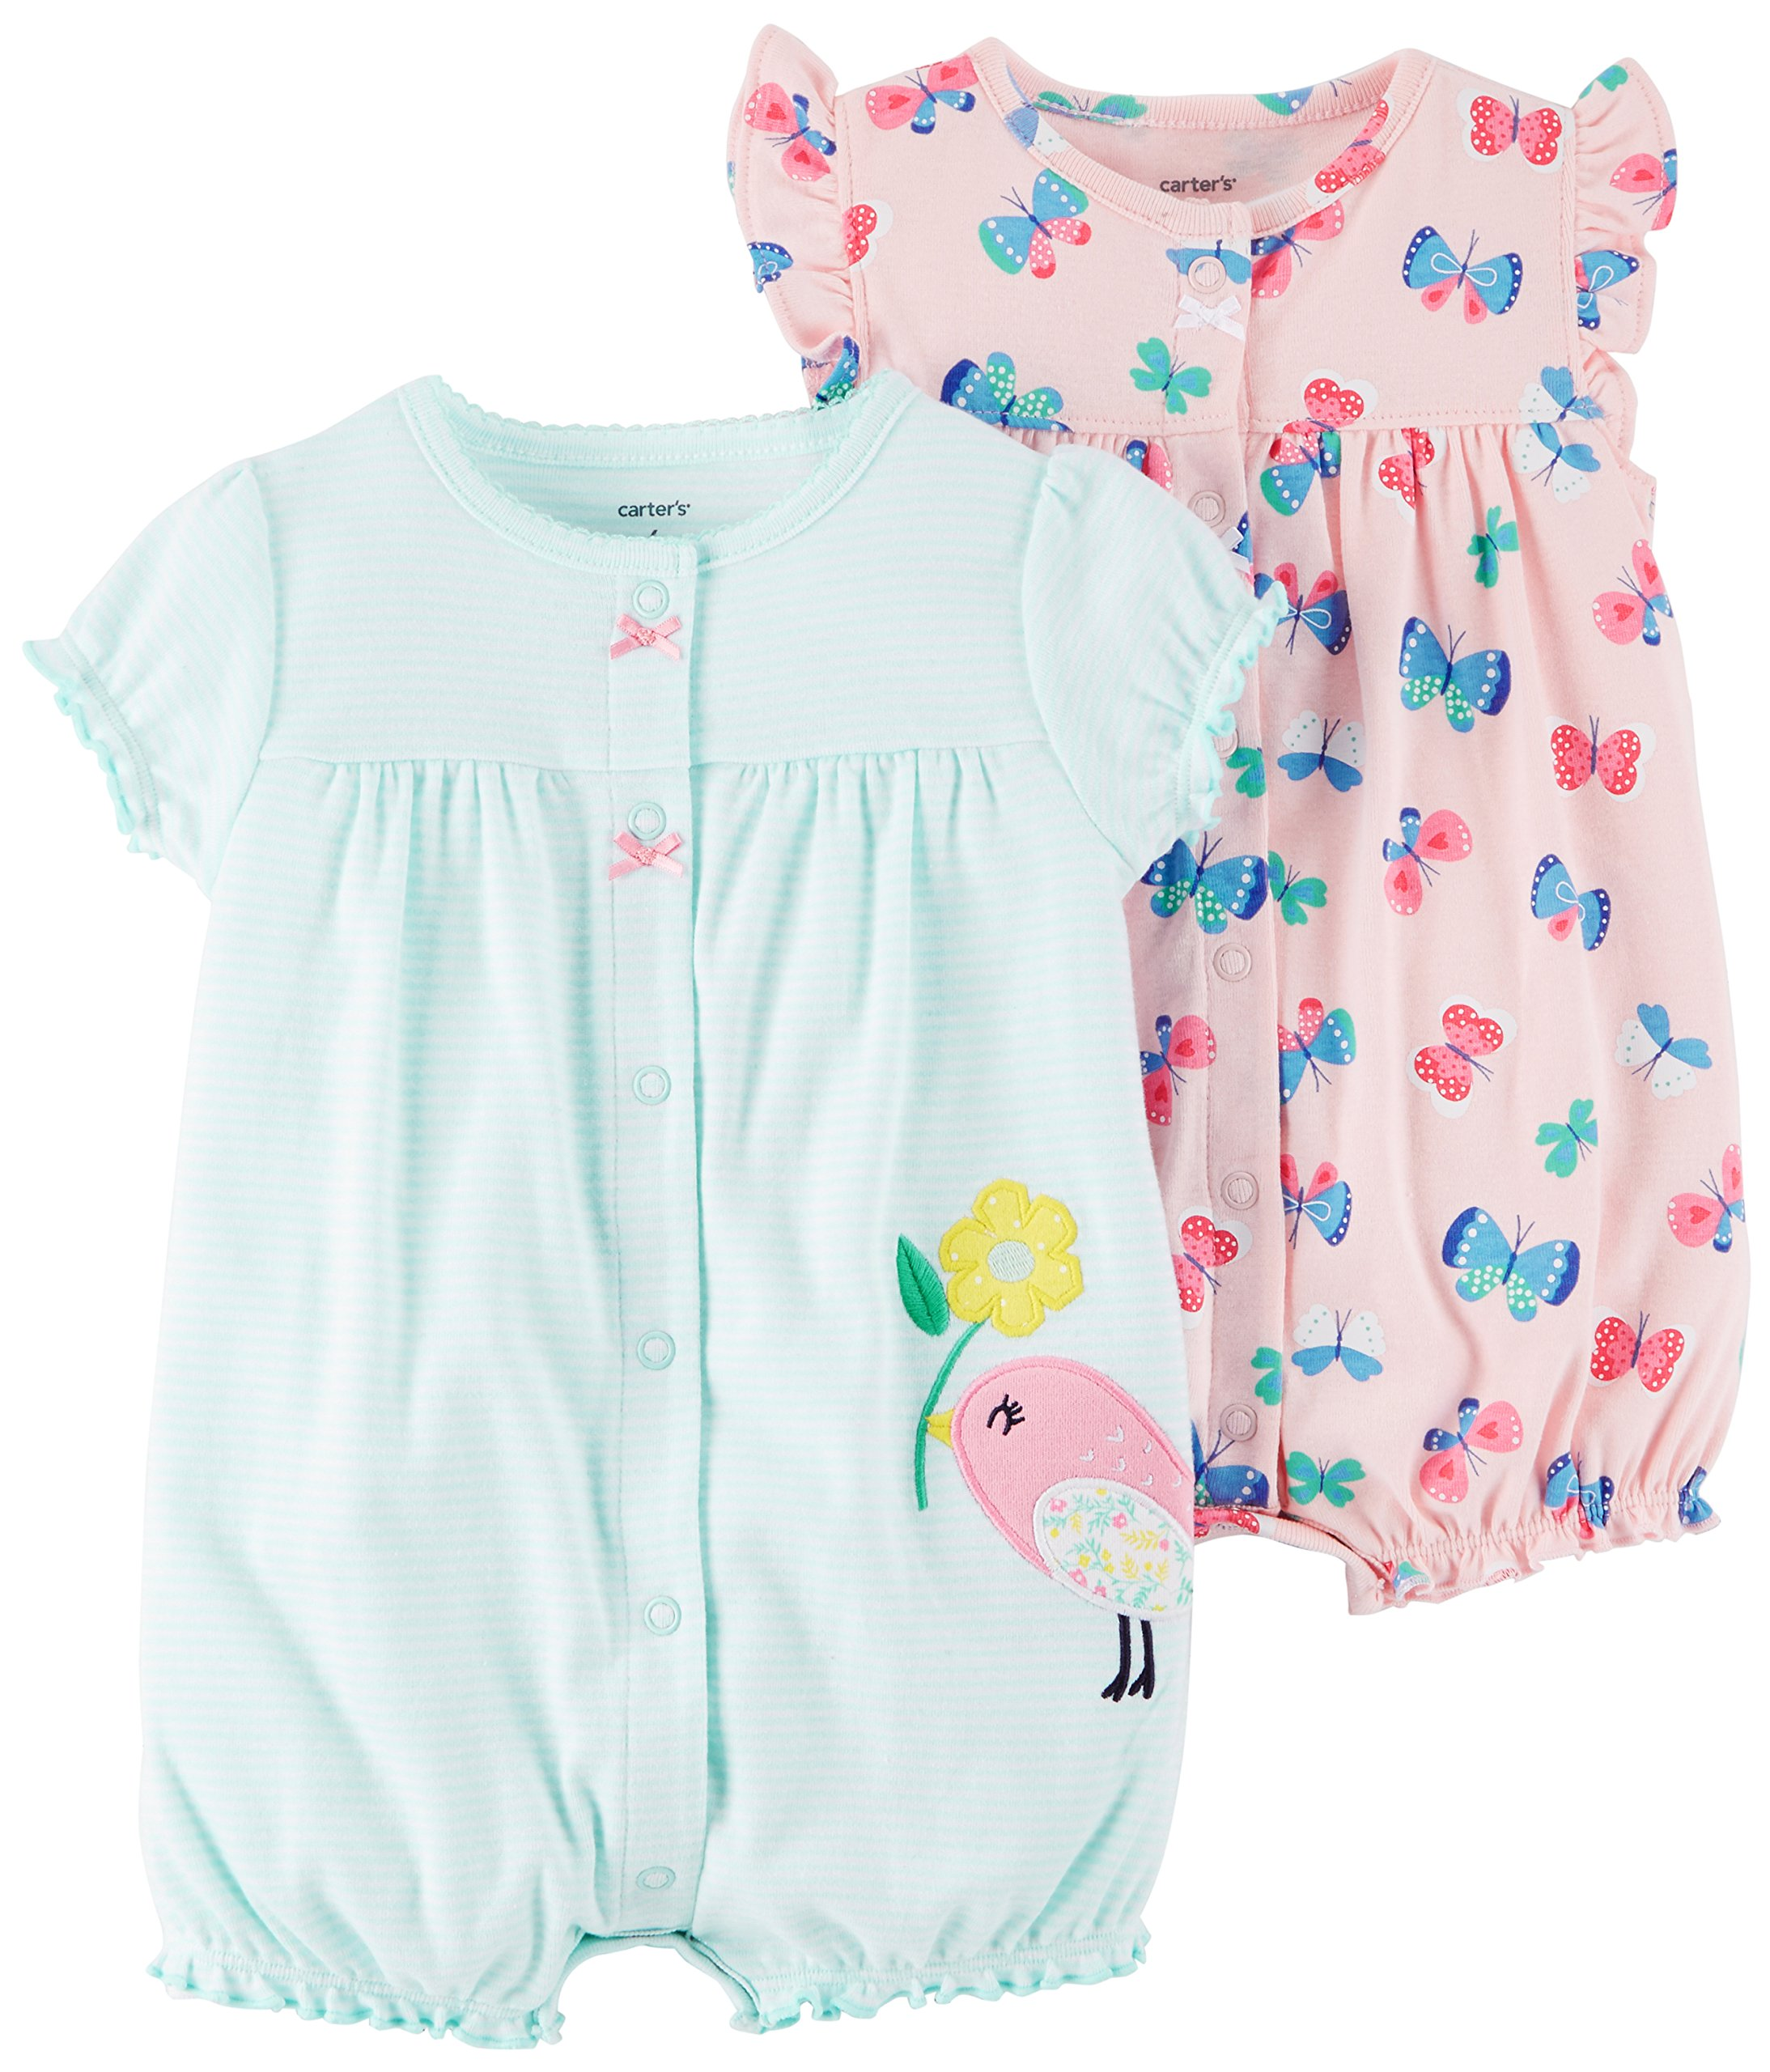 Carter's Baby Girls' 2-Pack